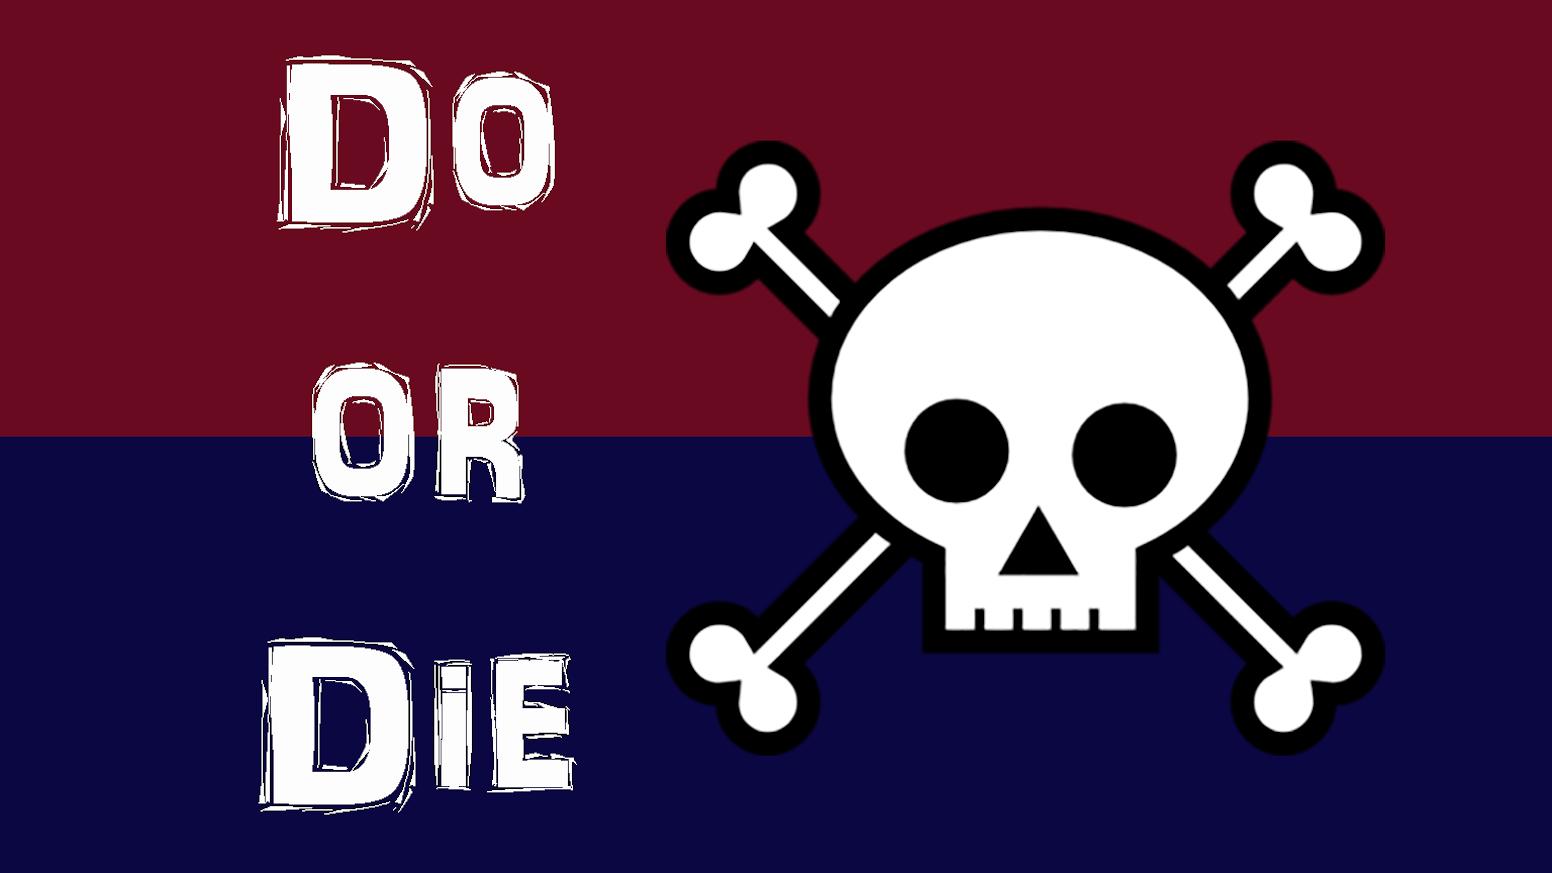 do or die by max goebel kickstarter